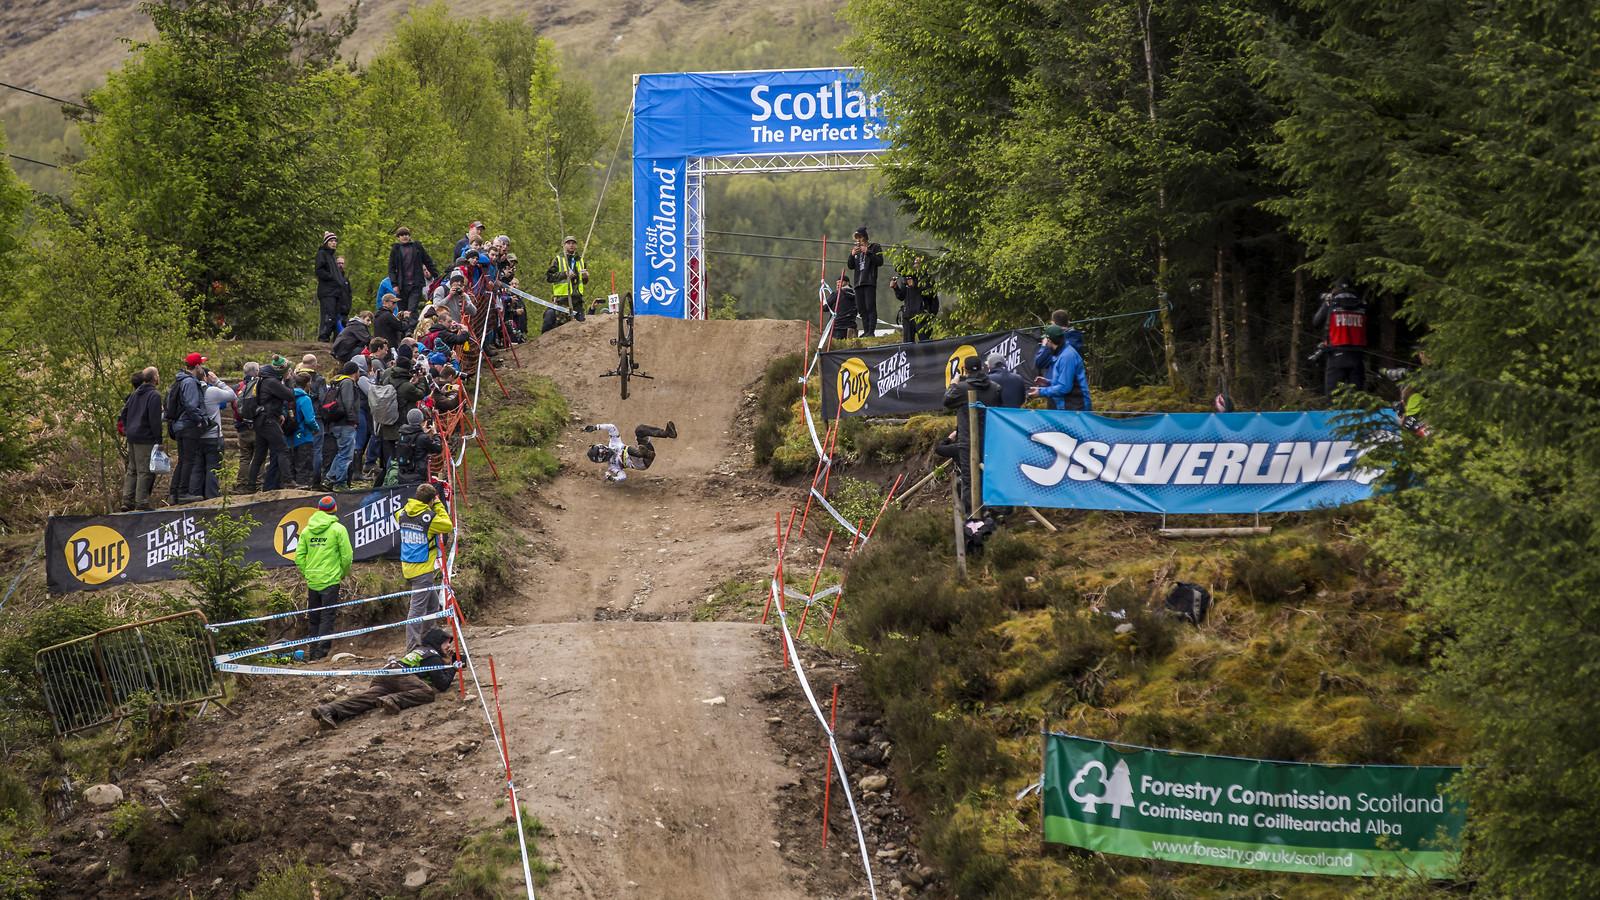 manon carpenter crash fort william wc - phunkt.com - Mountain Biking Pictures - Vital MTB